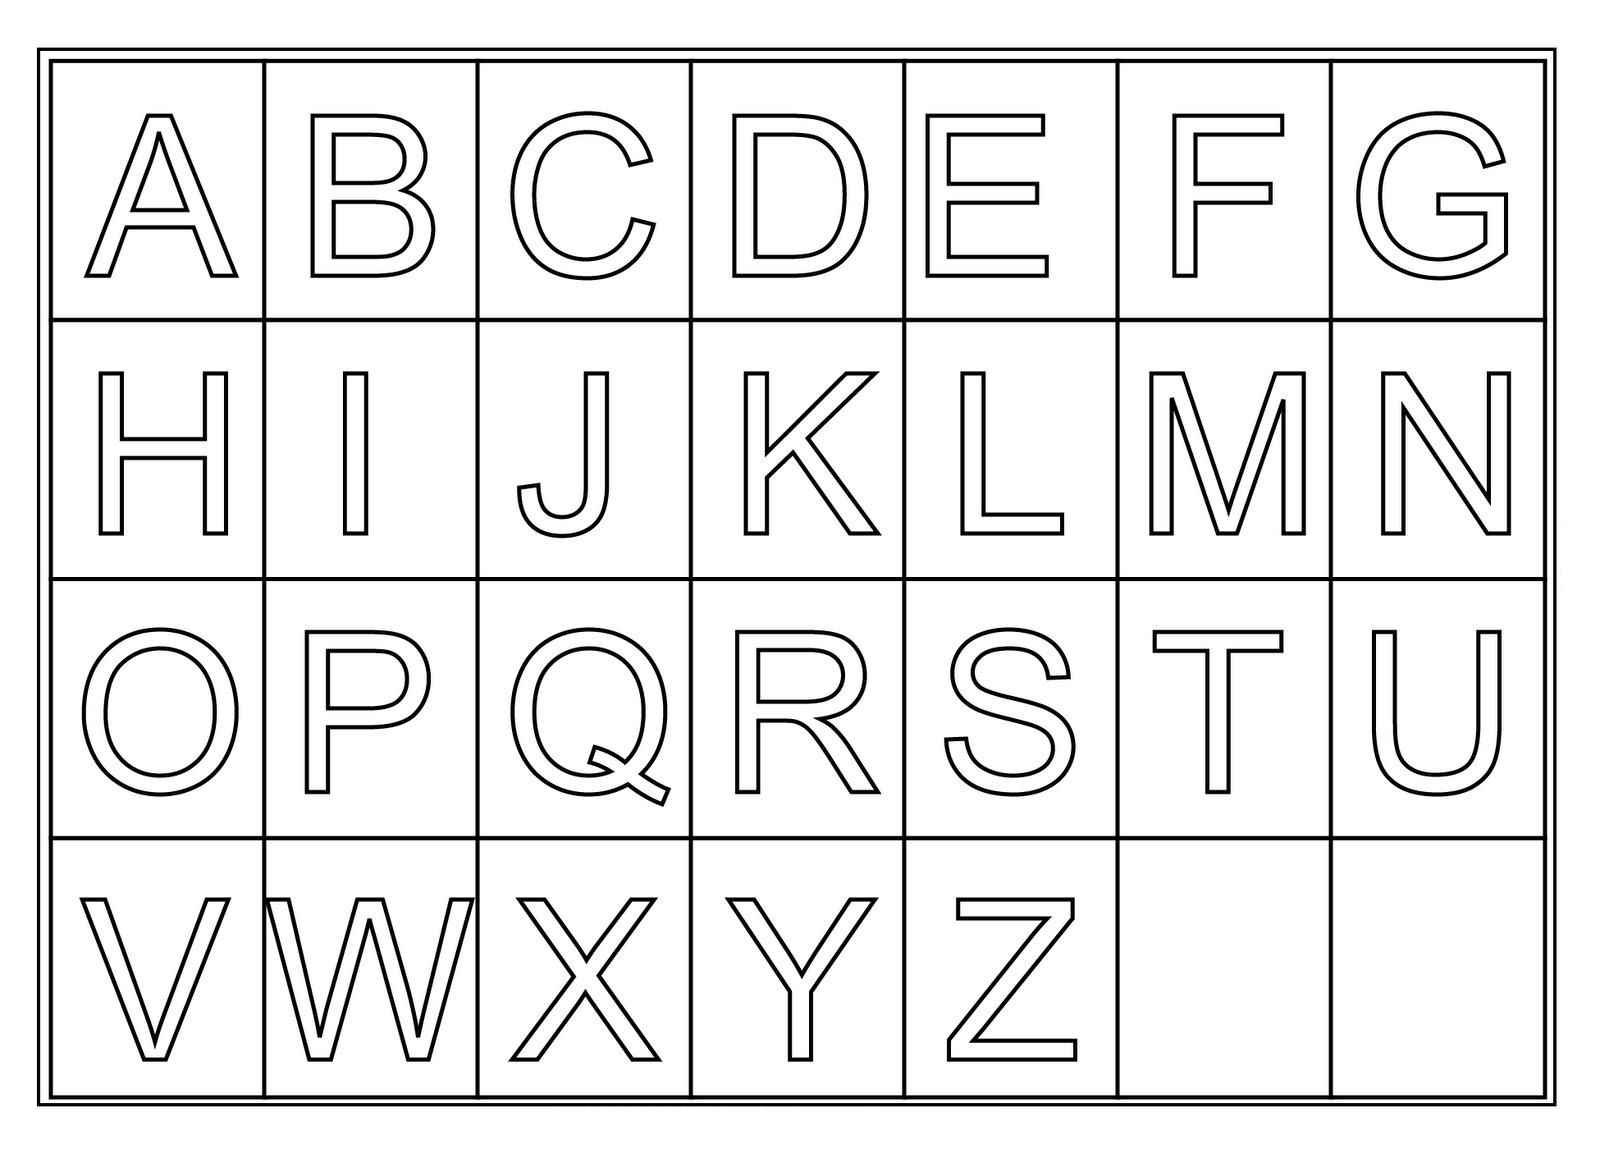 Worksheets On Letters For Preschoolers Printable